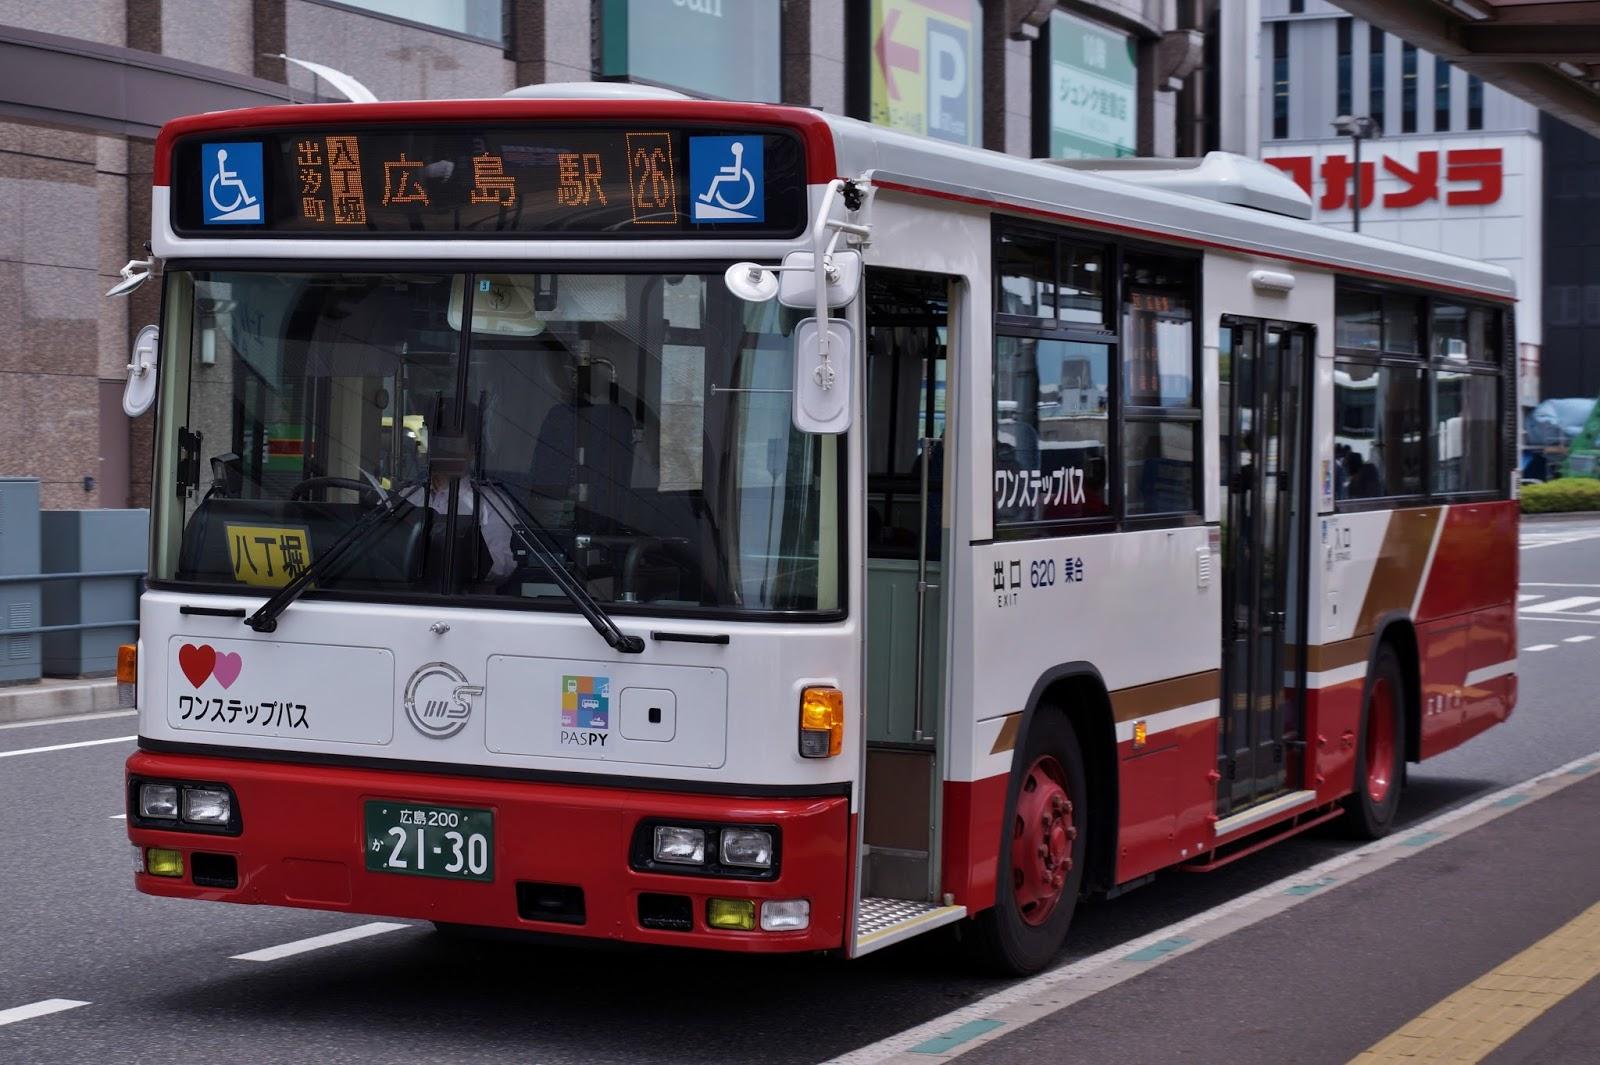 大日本交通株式会社 日暮里営業所の タクシー求人 …